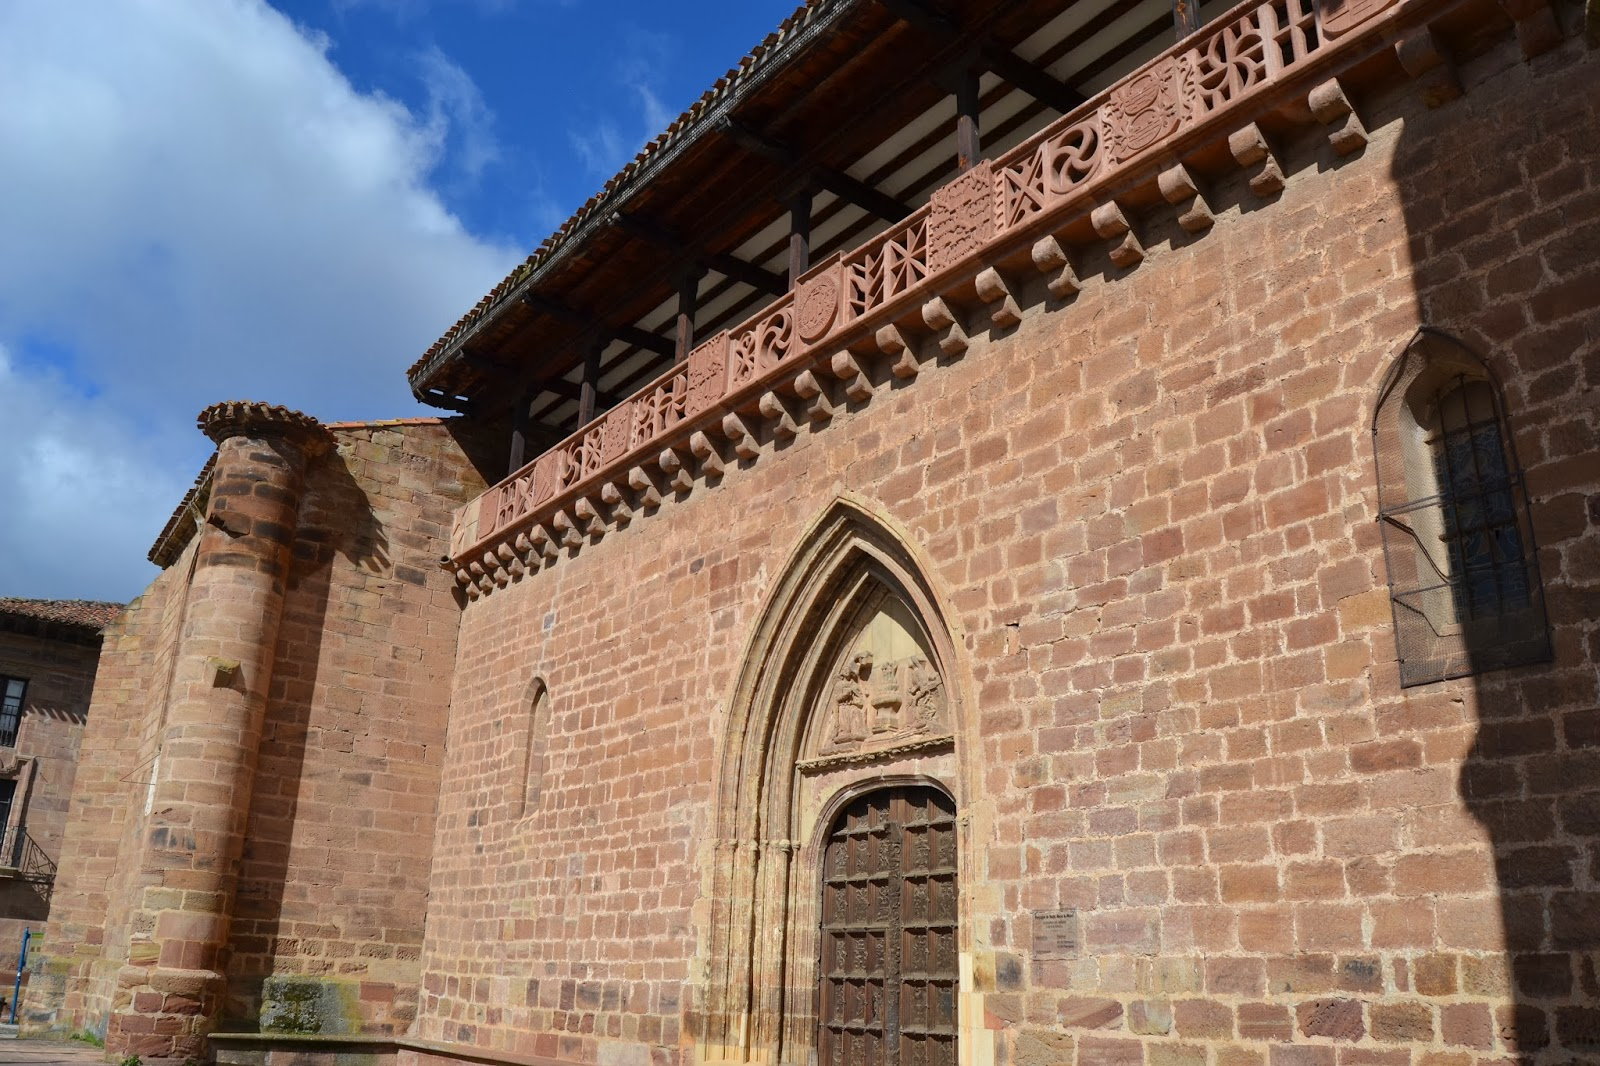 Iglesia de Santa María La Mayor, Ezcaray. Plaza de la Alameda. Guía de viaje de La Rioja Alta. Tu Maleta.